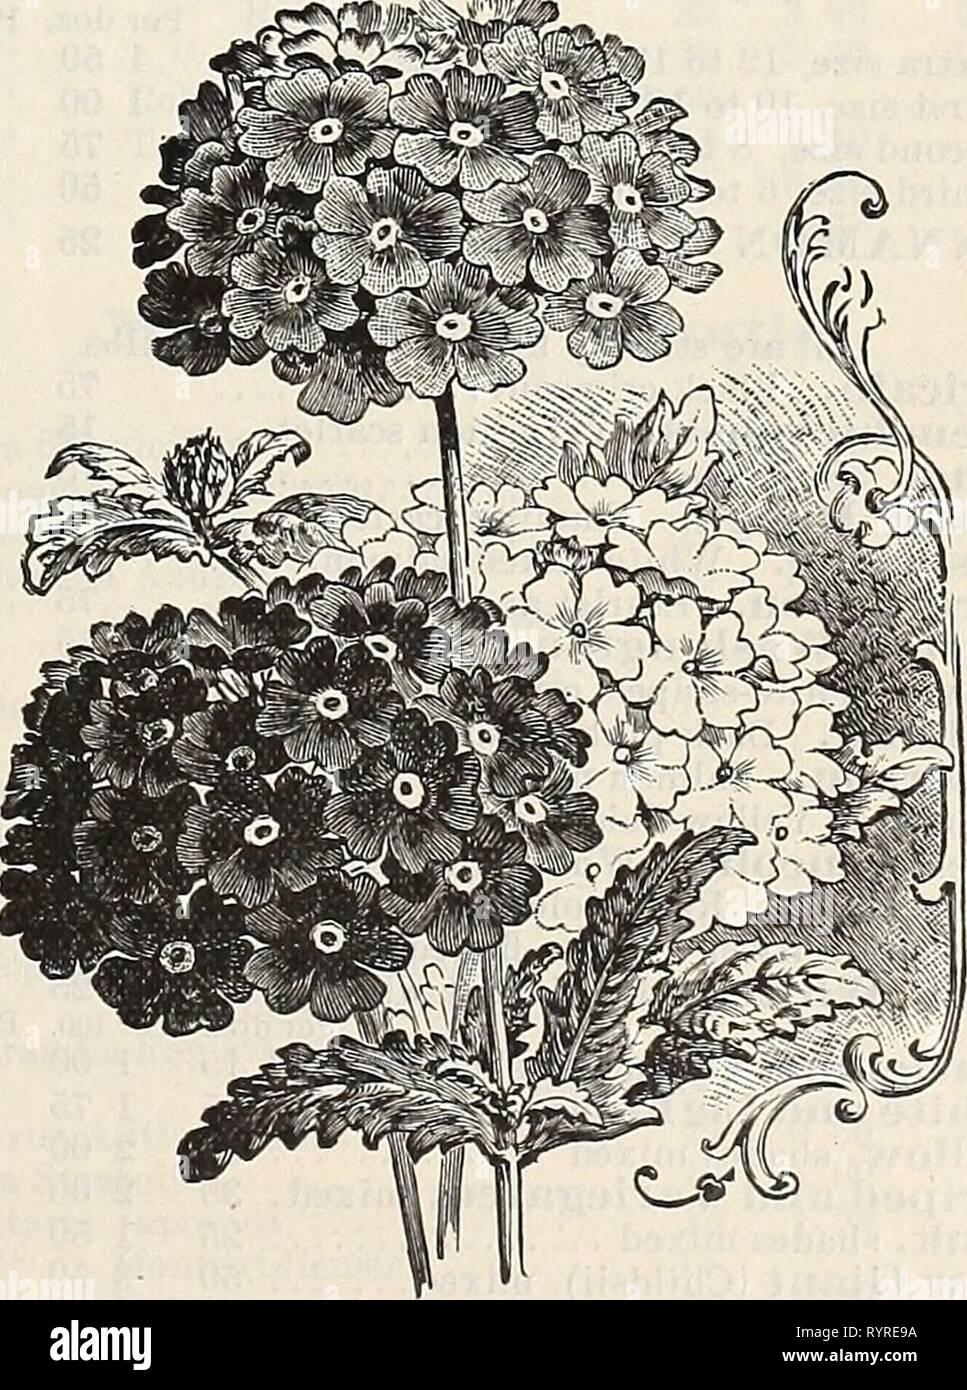 Dreer's quarterly wholesale price list Dreer's quarterly wholesale price list of vegetable seeds flower seeds bulbs aquatics decorative plants hard plants tools implements etc., etc . dreersquarterlyw1900henr_0 Year: 1900  ViNCA Rosea Alba. WaXeriana., rm^tdi {Garden Heliotrope) . . . Verbena, Dreer's Mammoth, white . . . ' ' scarlet . . . ' ' pink .... ' ' purple . . . ' ' striped . . . ' ' mixed . . . hybrida extra choice mixed Lemon, [Aloysia citriodora) Venosa, purplish heliotrope, fine bedding plant Erinoides, deep lilac, excellent for baskets, vases, etc Vlnca, rosea, rose with dark eye  - Stock Image